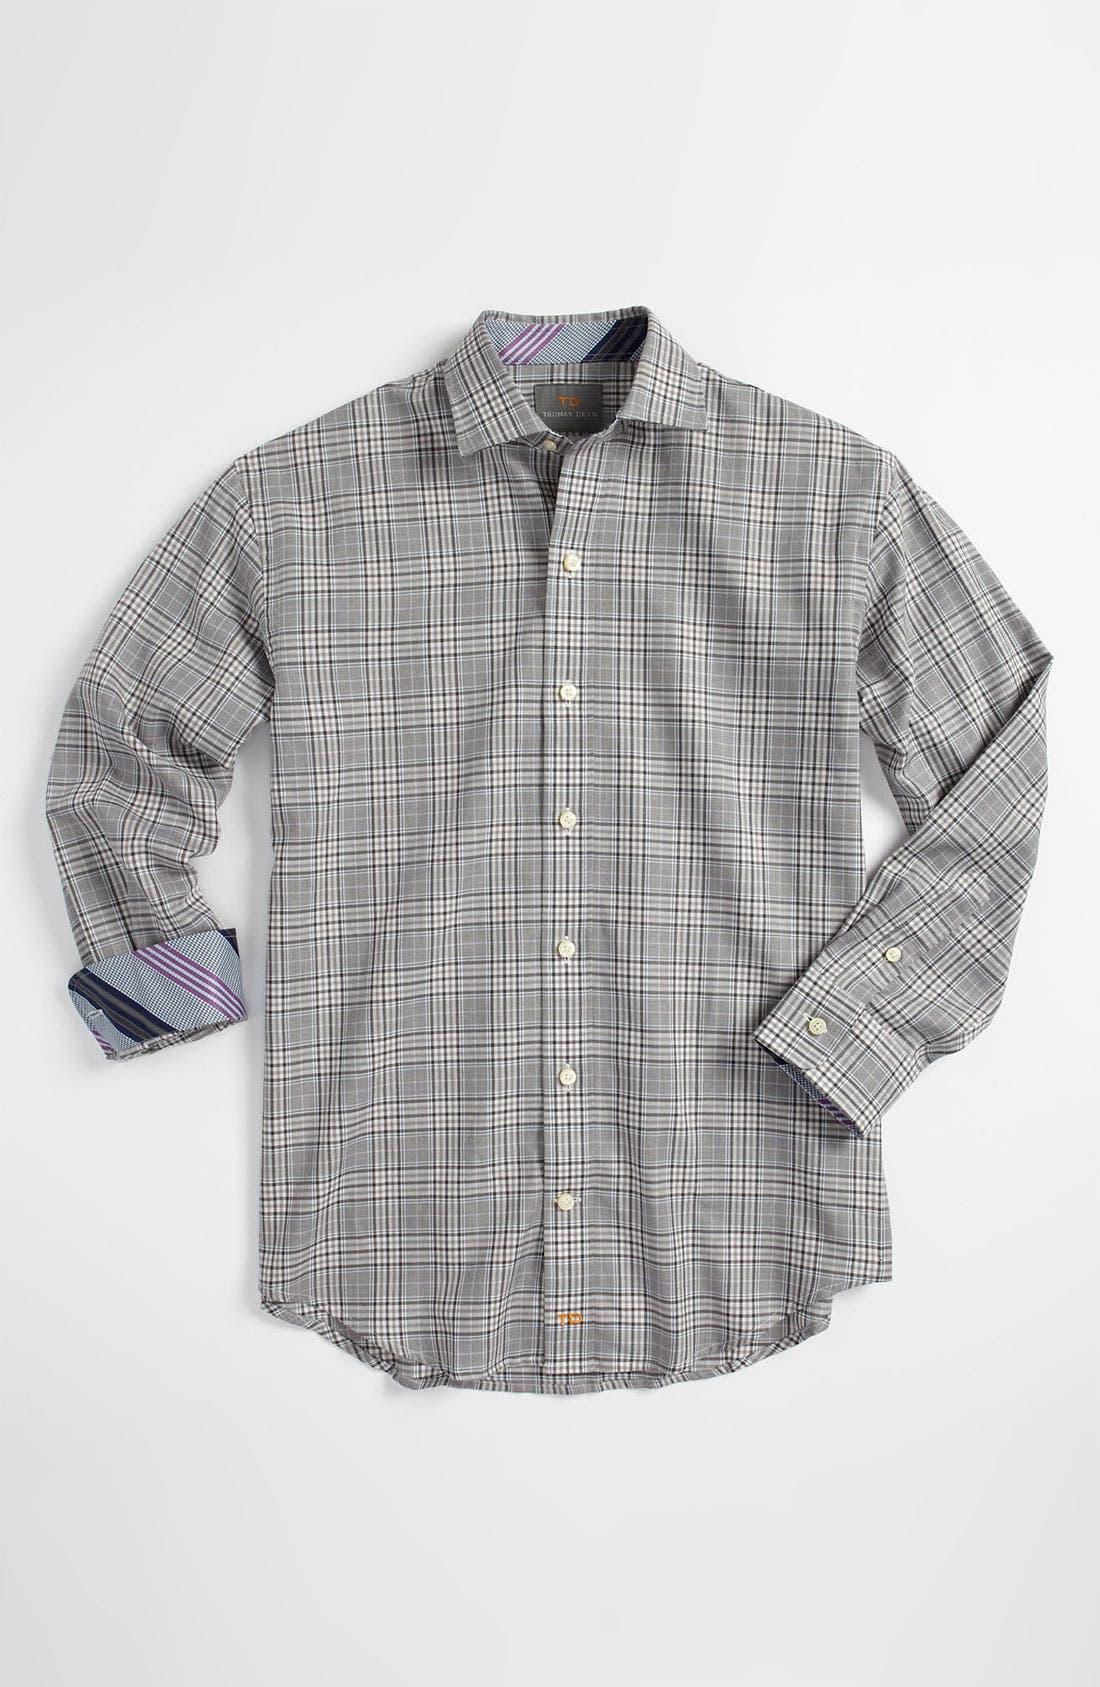 Alternate Image 1 Selected - Thomas Dean Dress Shirt (Big Boys)